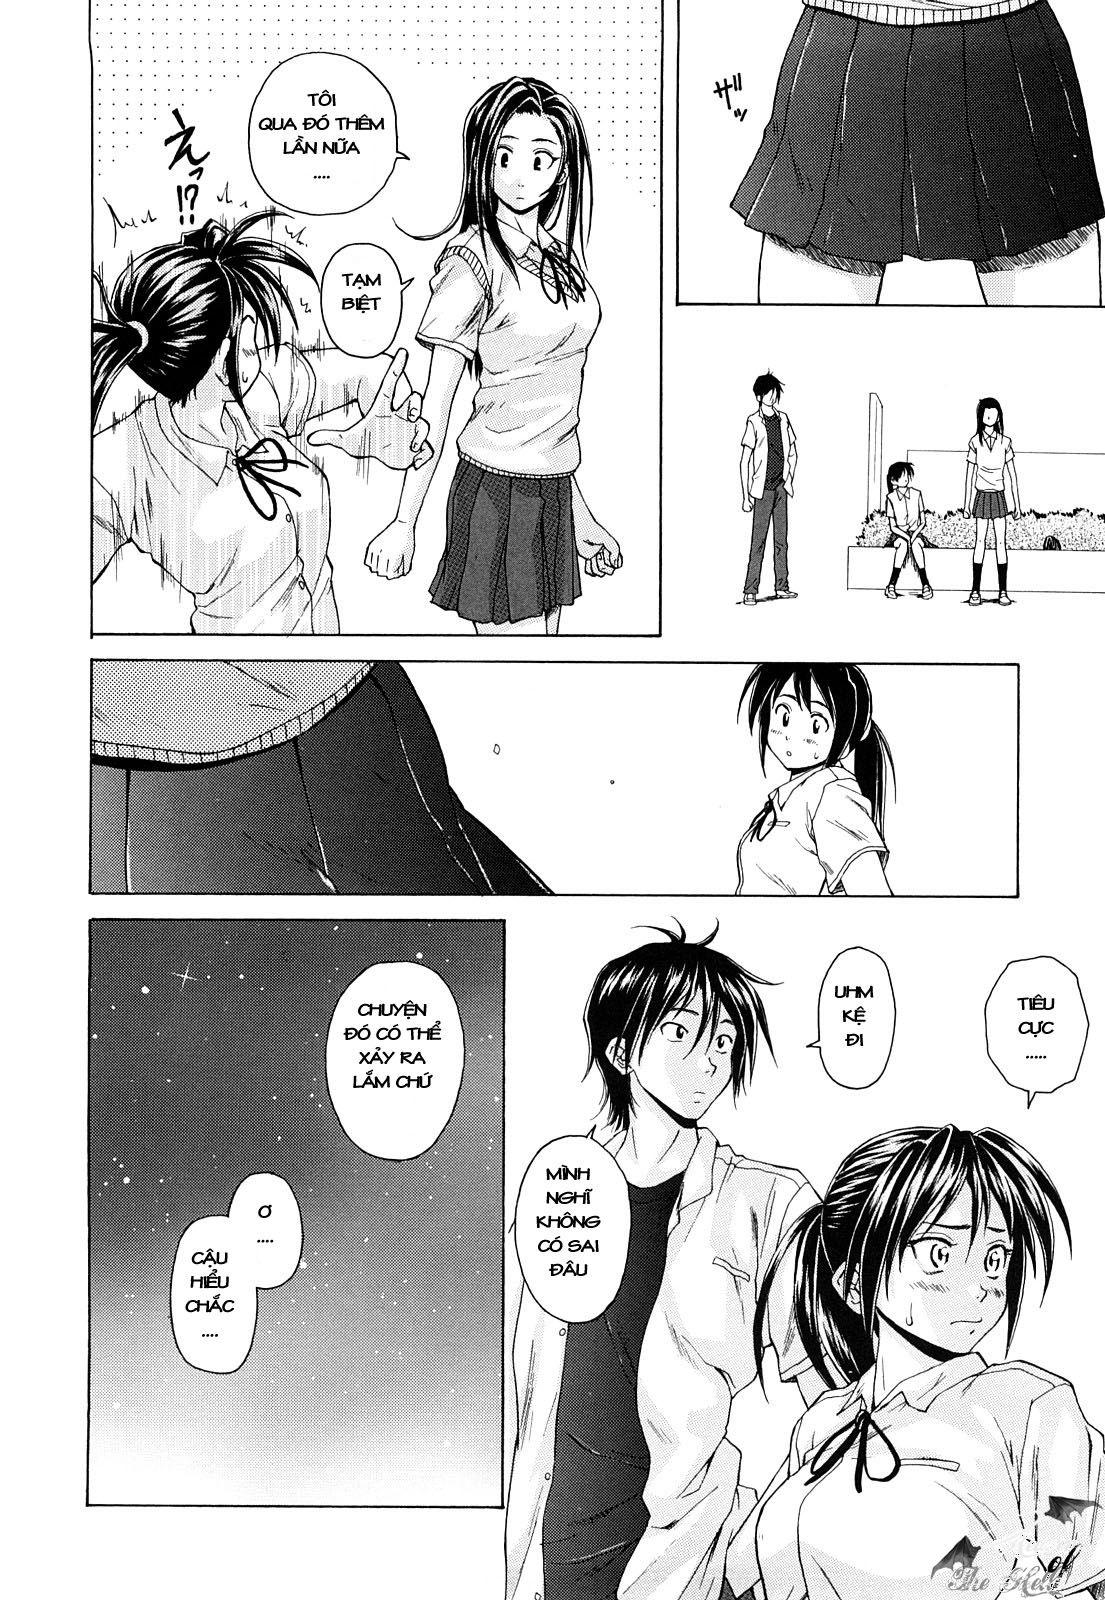 TruyenHay.Com - Ảnh 13 - Setsunai Omoi Chapter 3